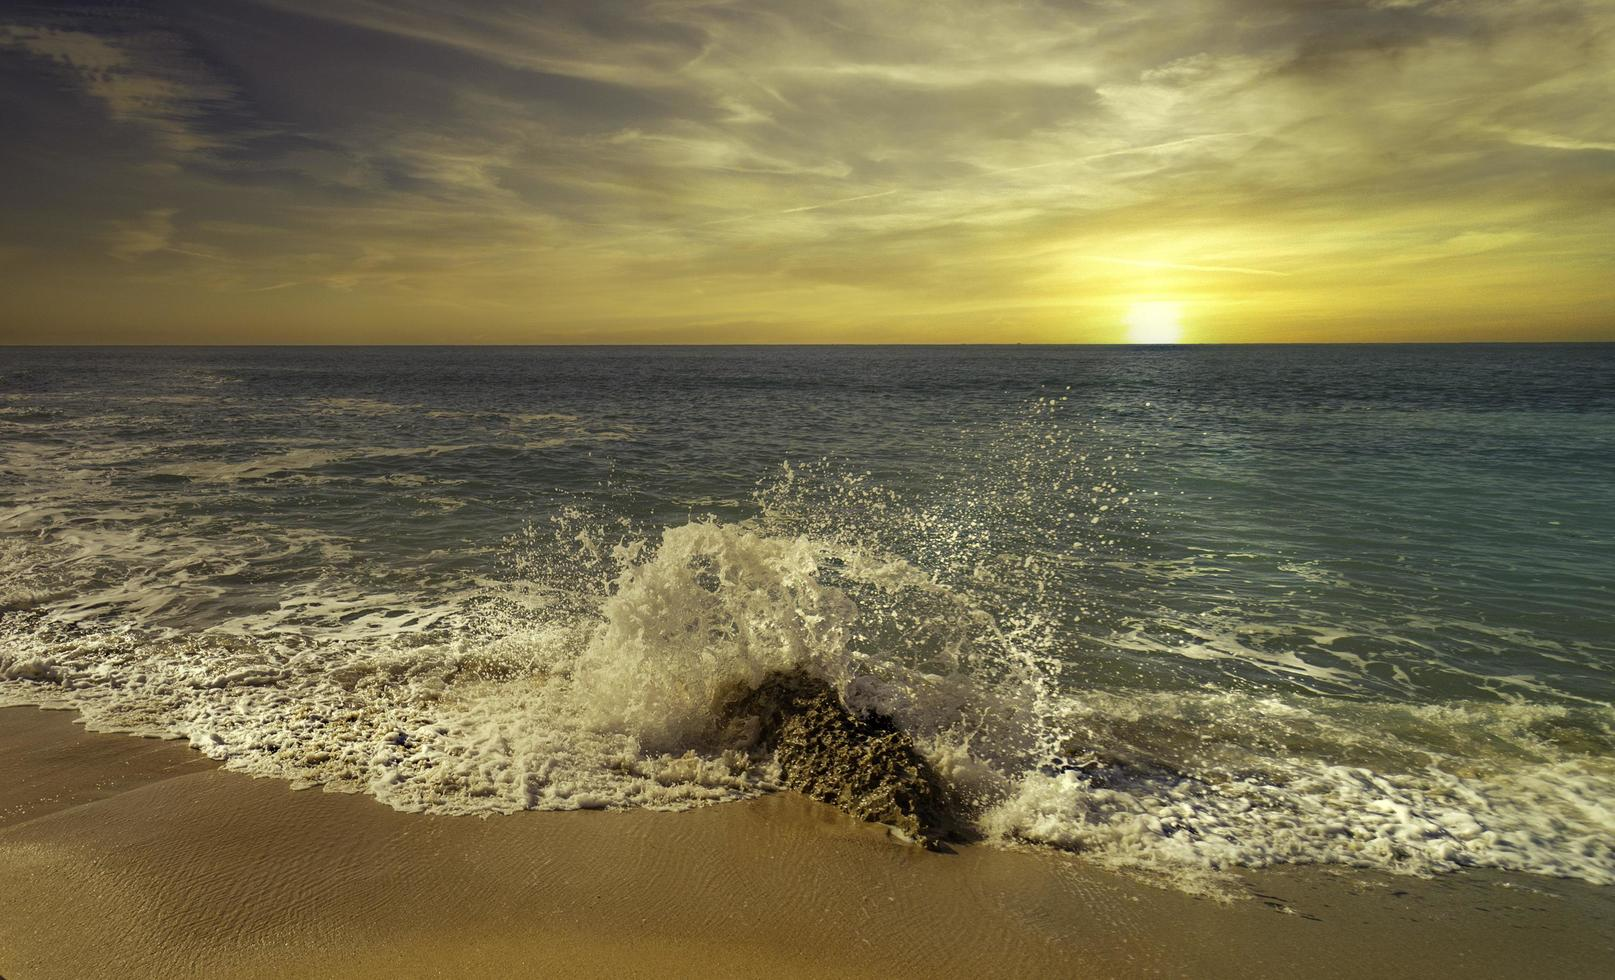 Waves splashing on beach at sunset photo